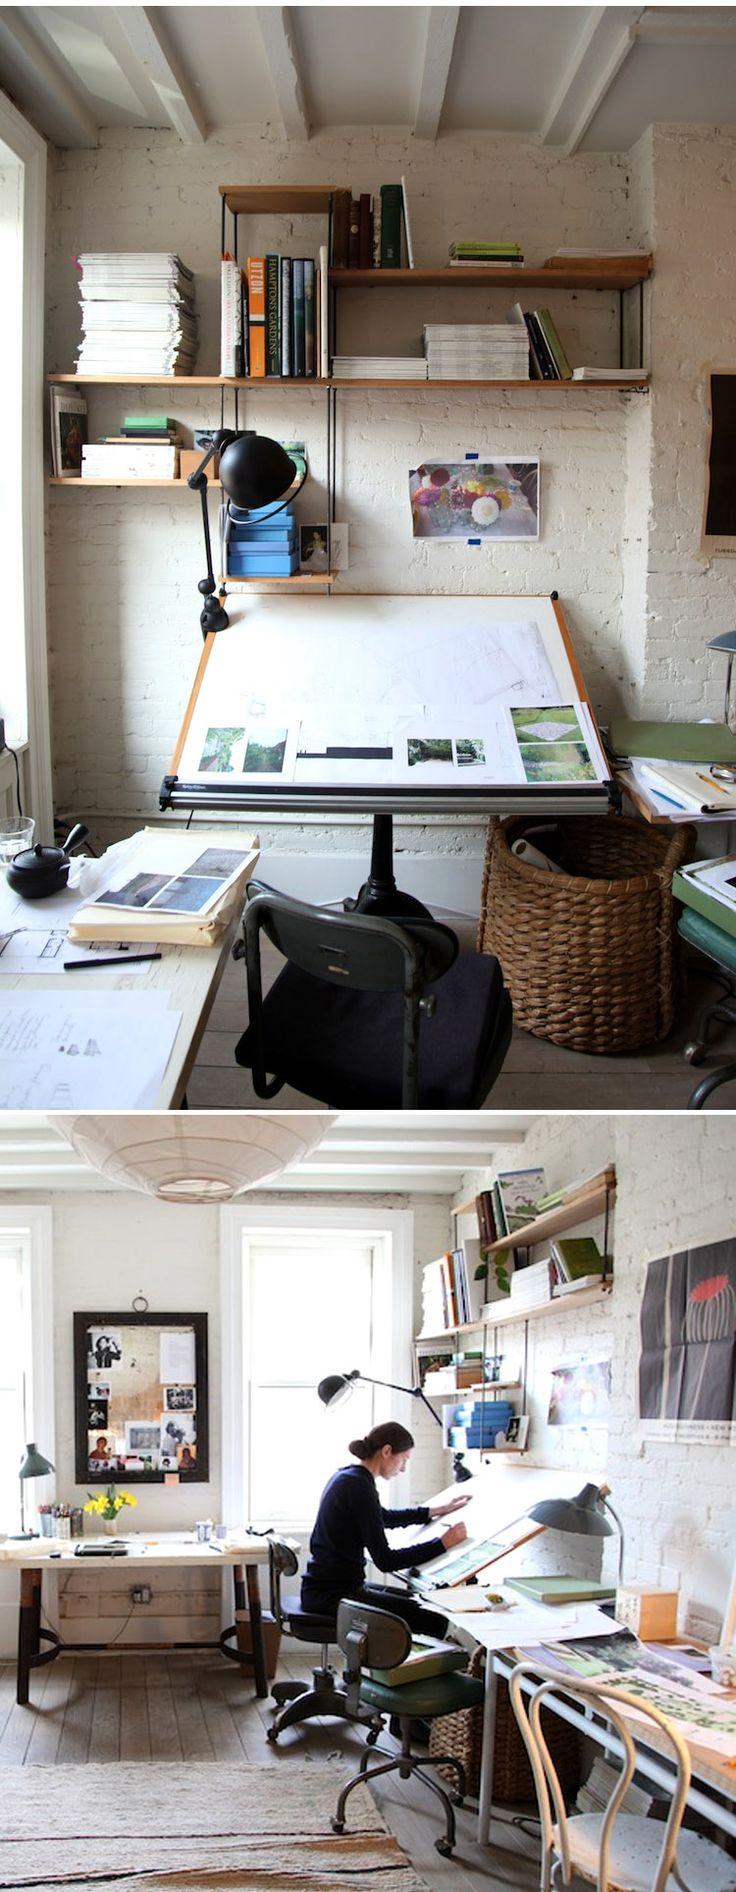 Creative space :: Miranda Brooks http://alovelybeing.com/journal/creativity-at-work-miranda-brooks.html